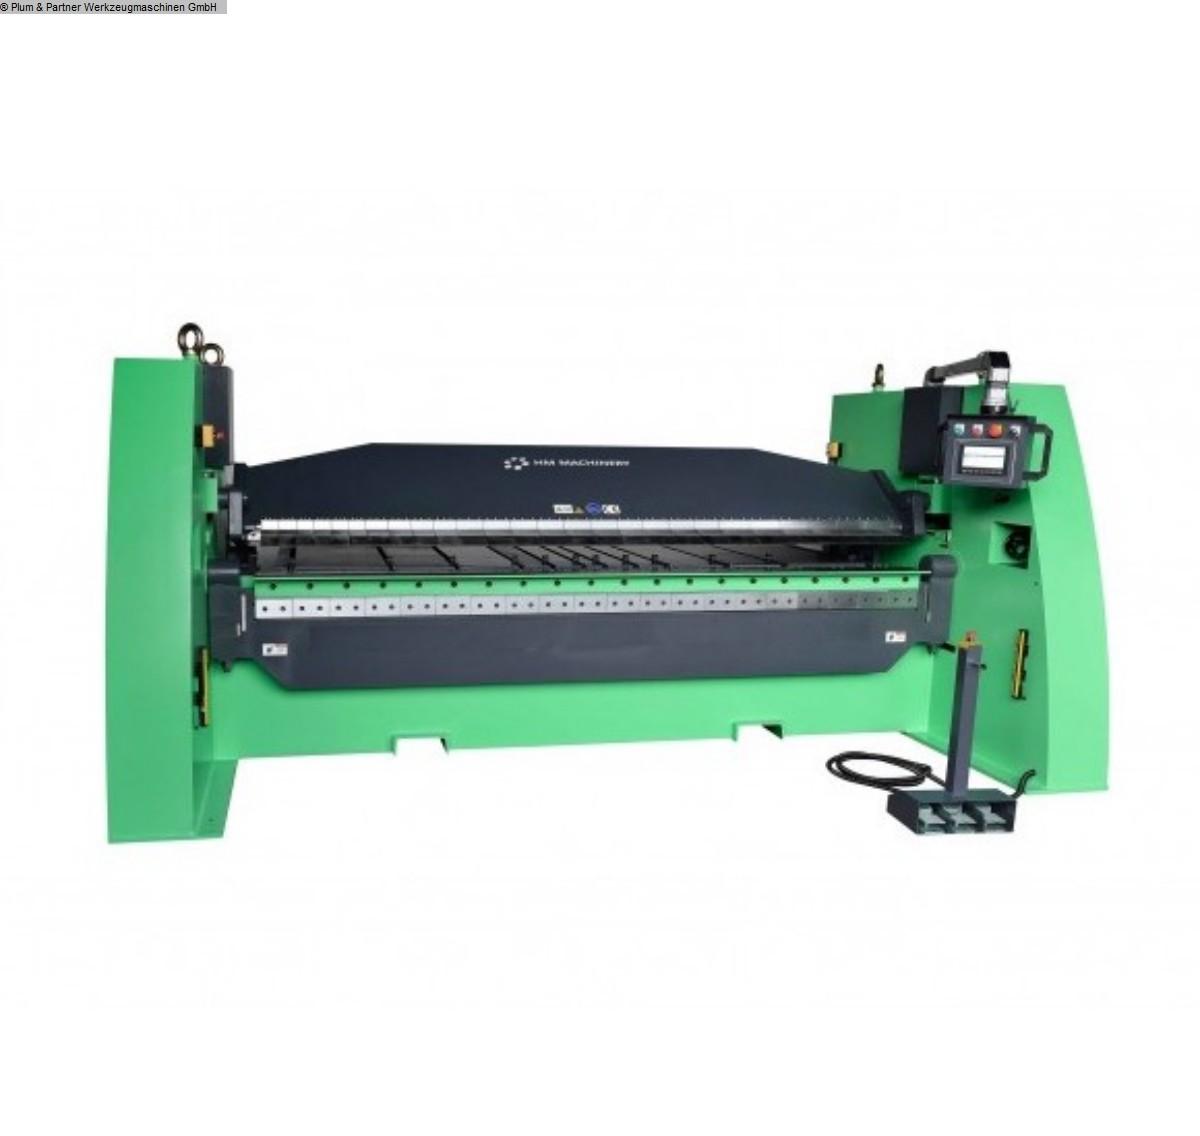 gebrauchte Blechbearbeitung / Scheren / Biegen / Richten Schwenkbiegemaschine HM Machinery HBM 3100-65S